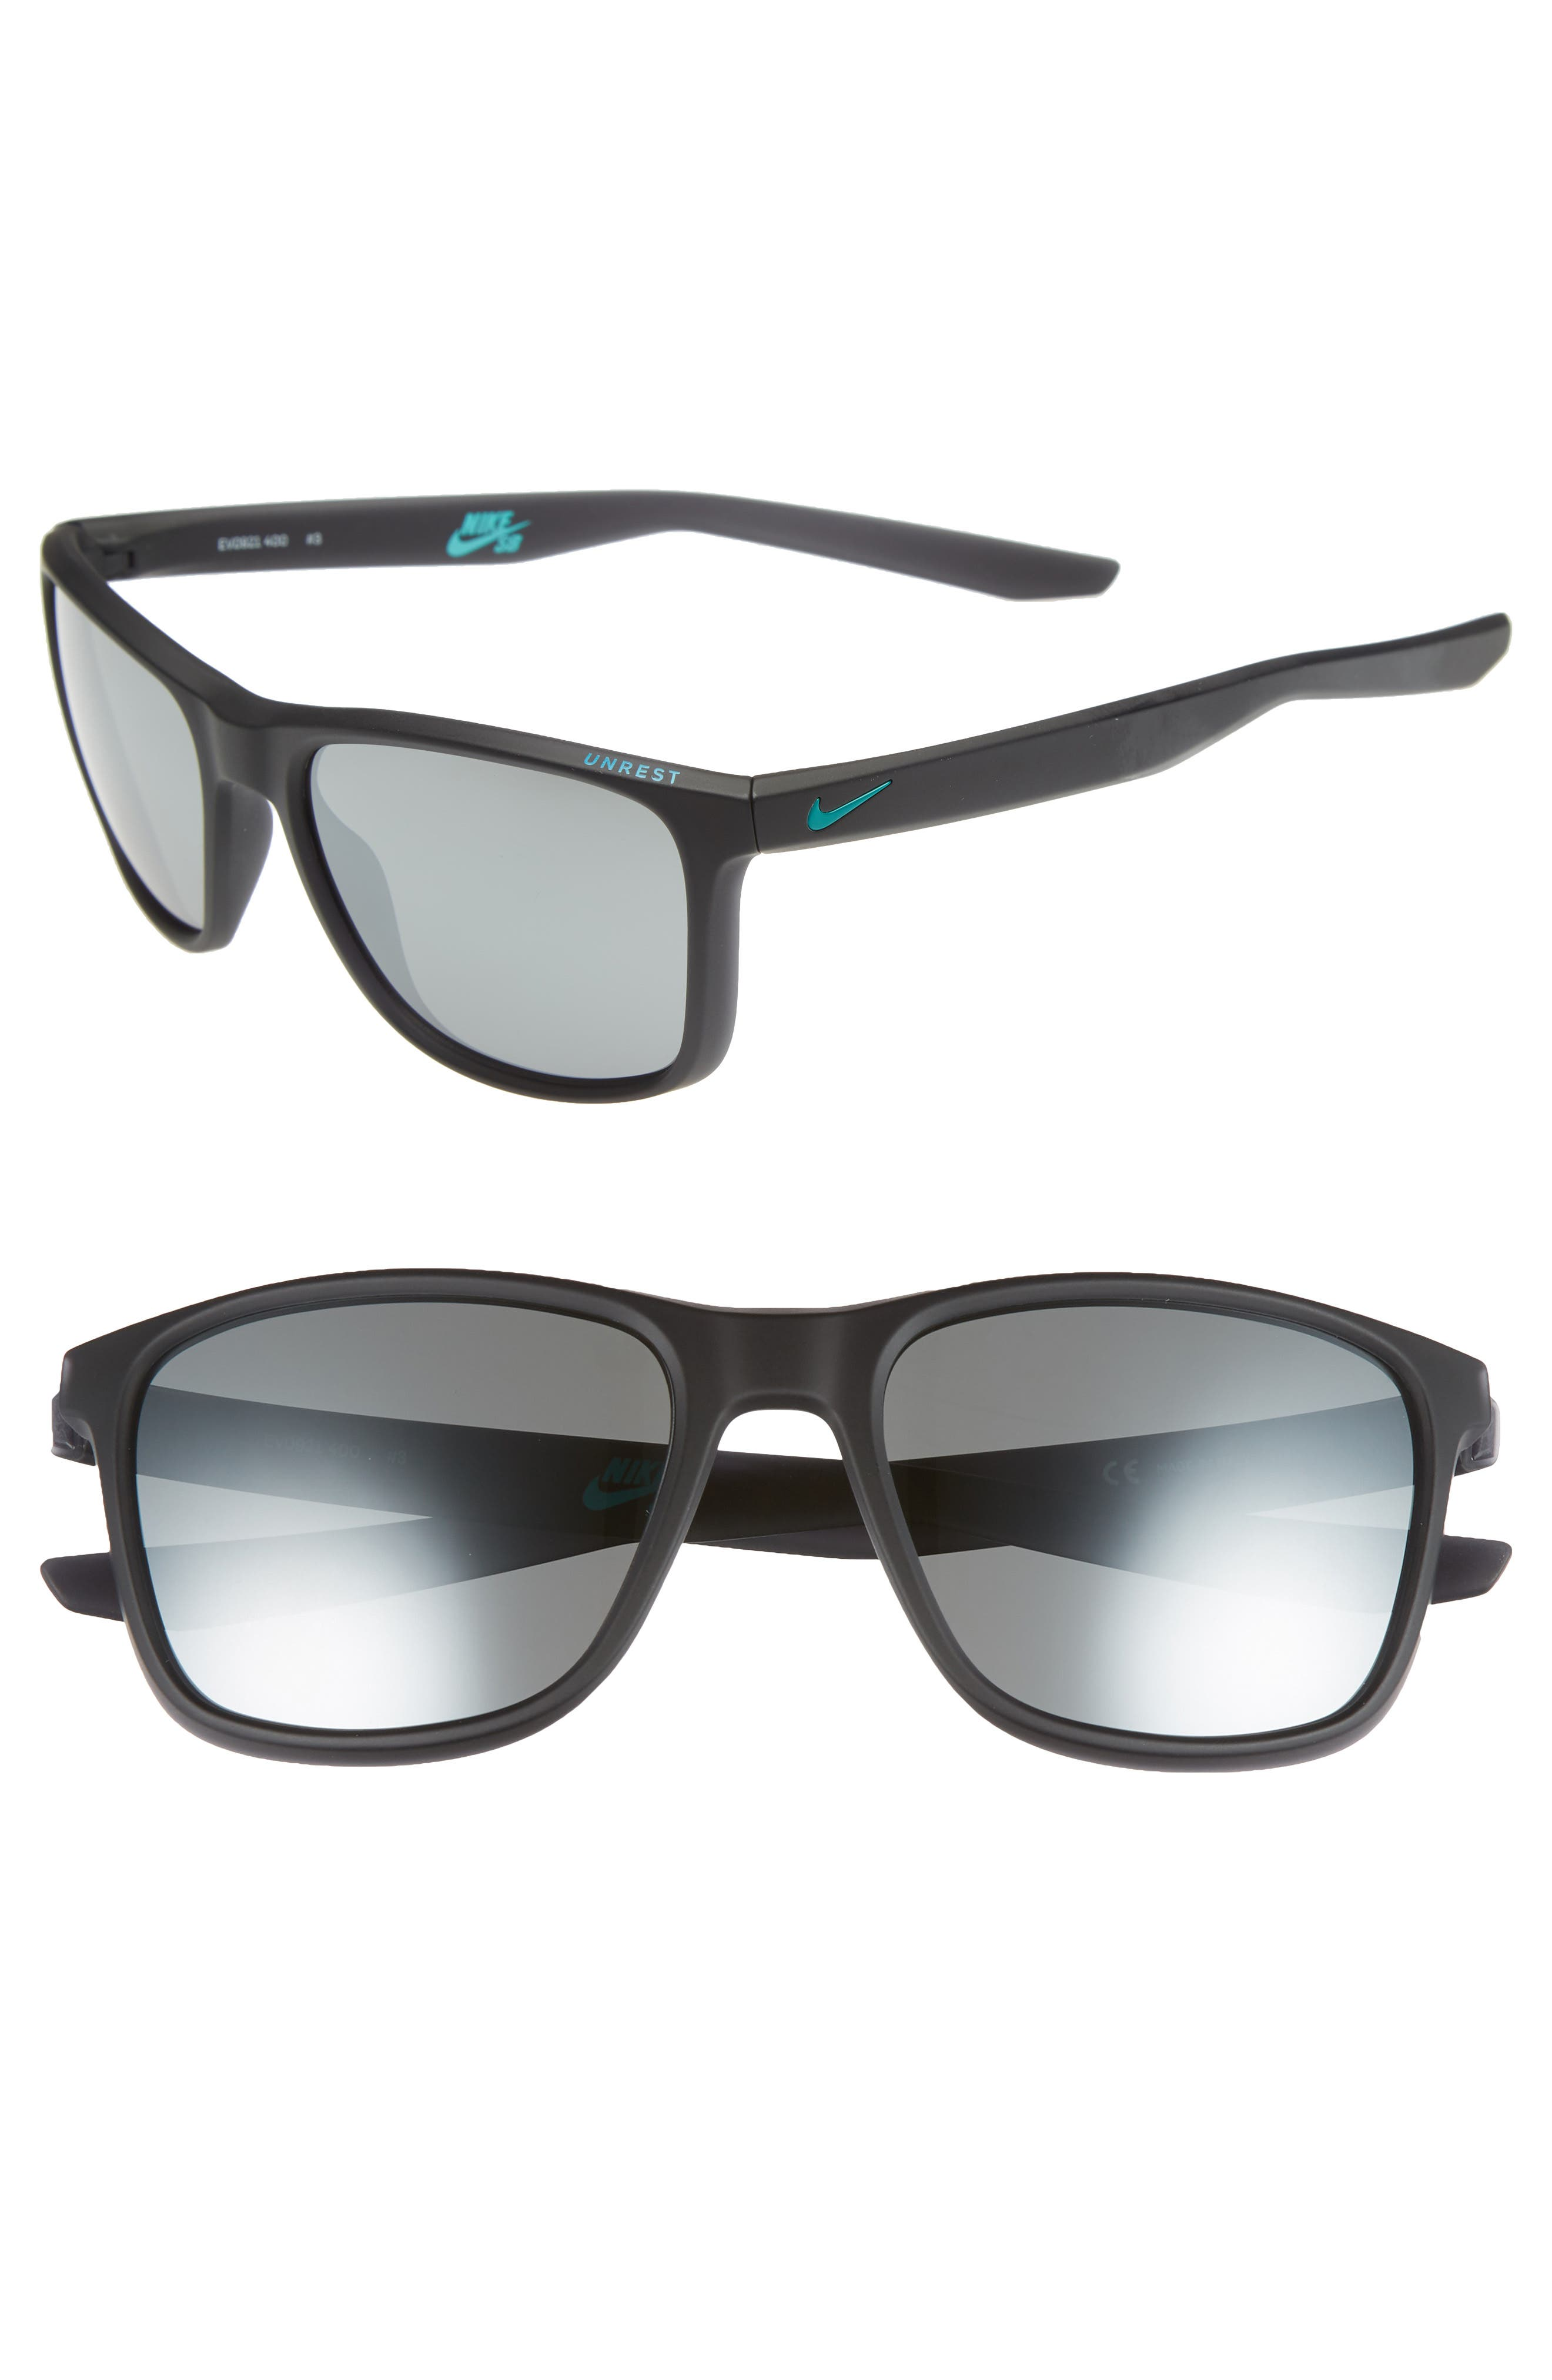 Unrest 57mm Sunglasses,                             Main thumbnail 1, color,                             MATTE OBSIDIAN/ GREY SILVER